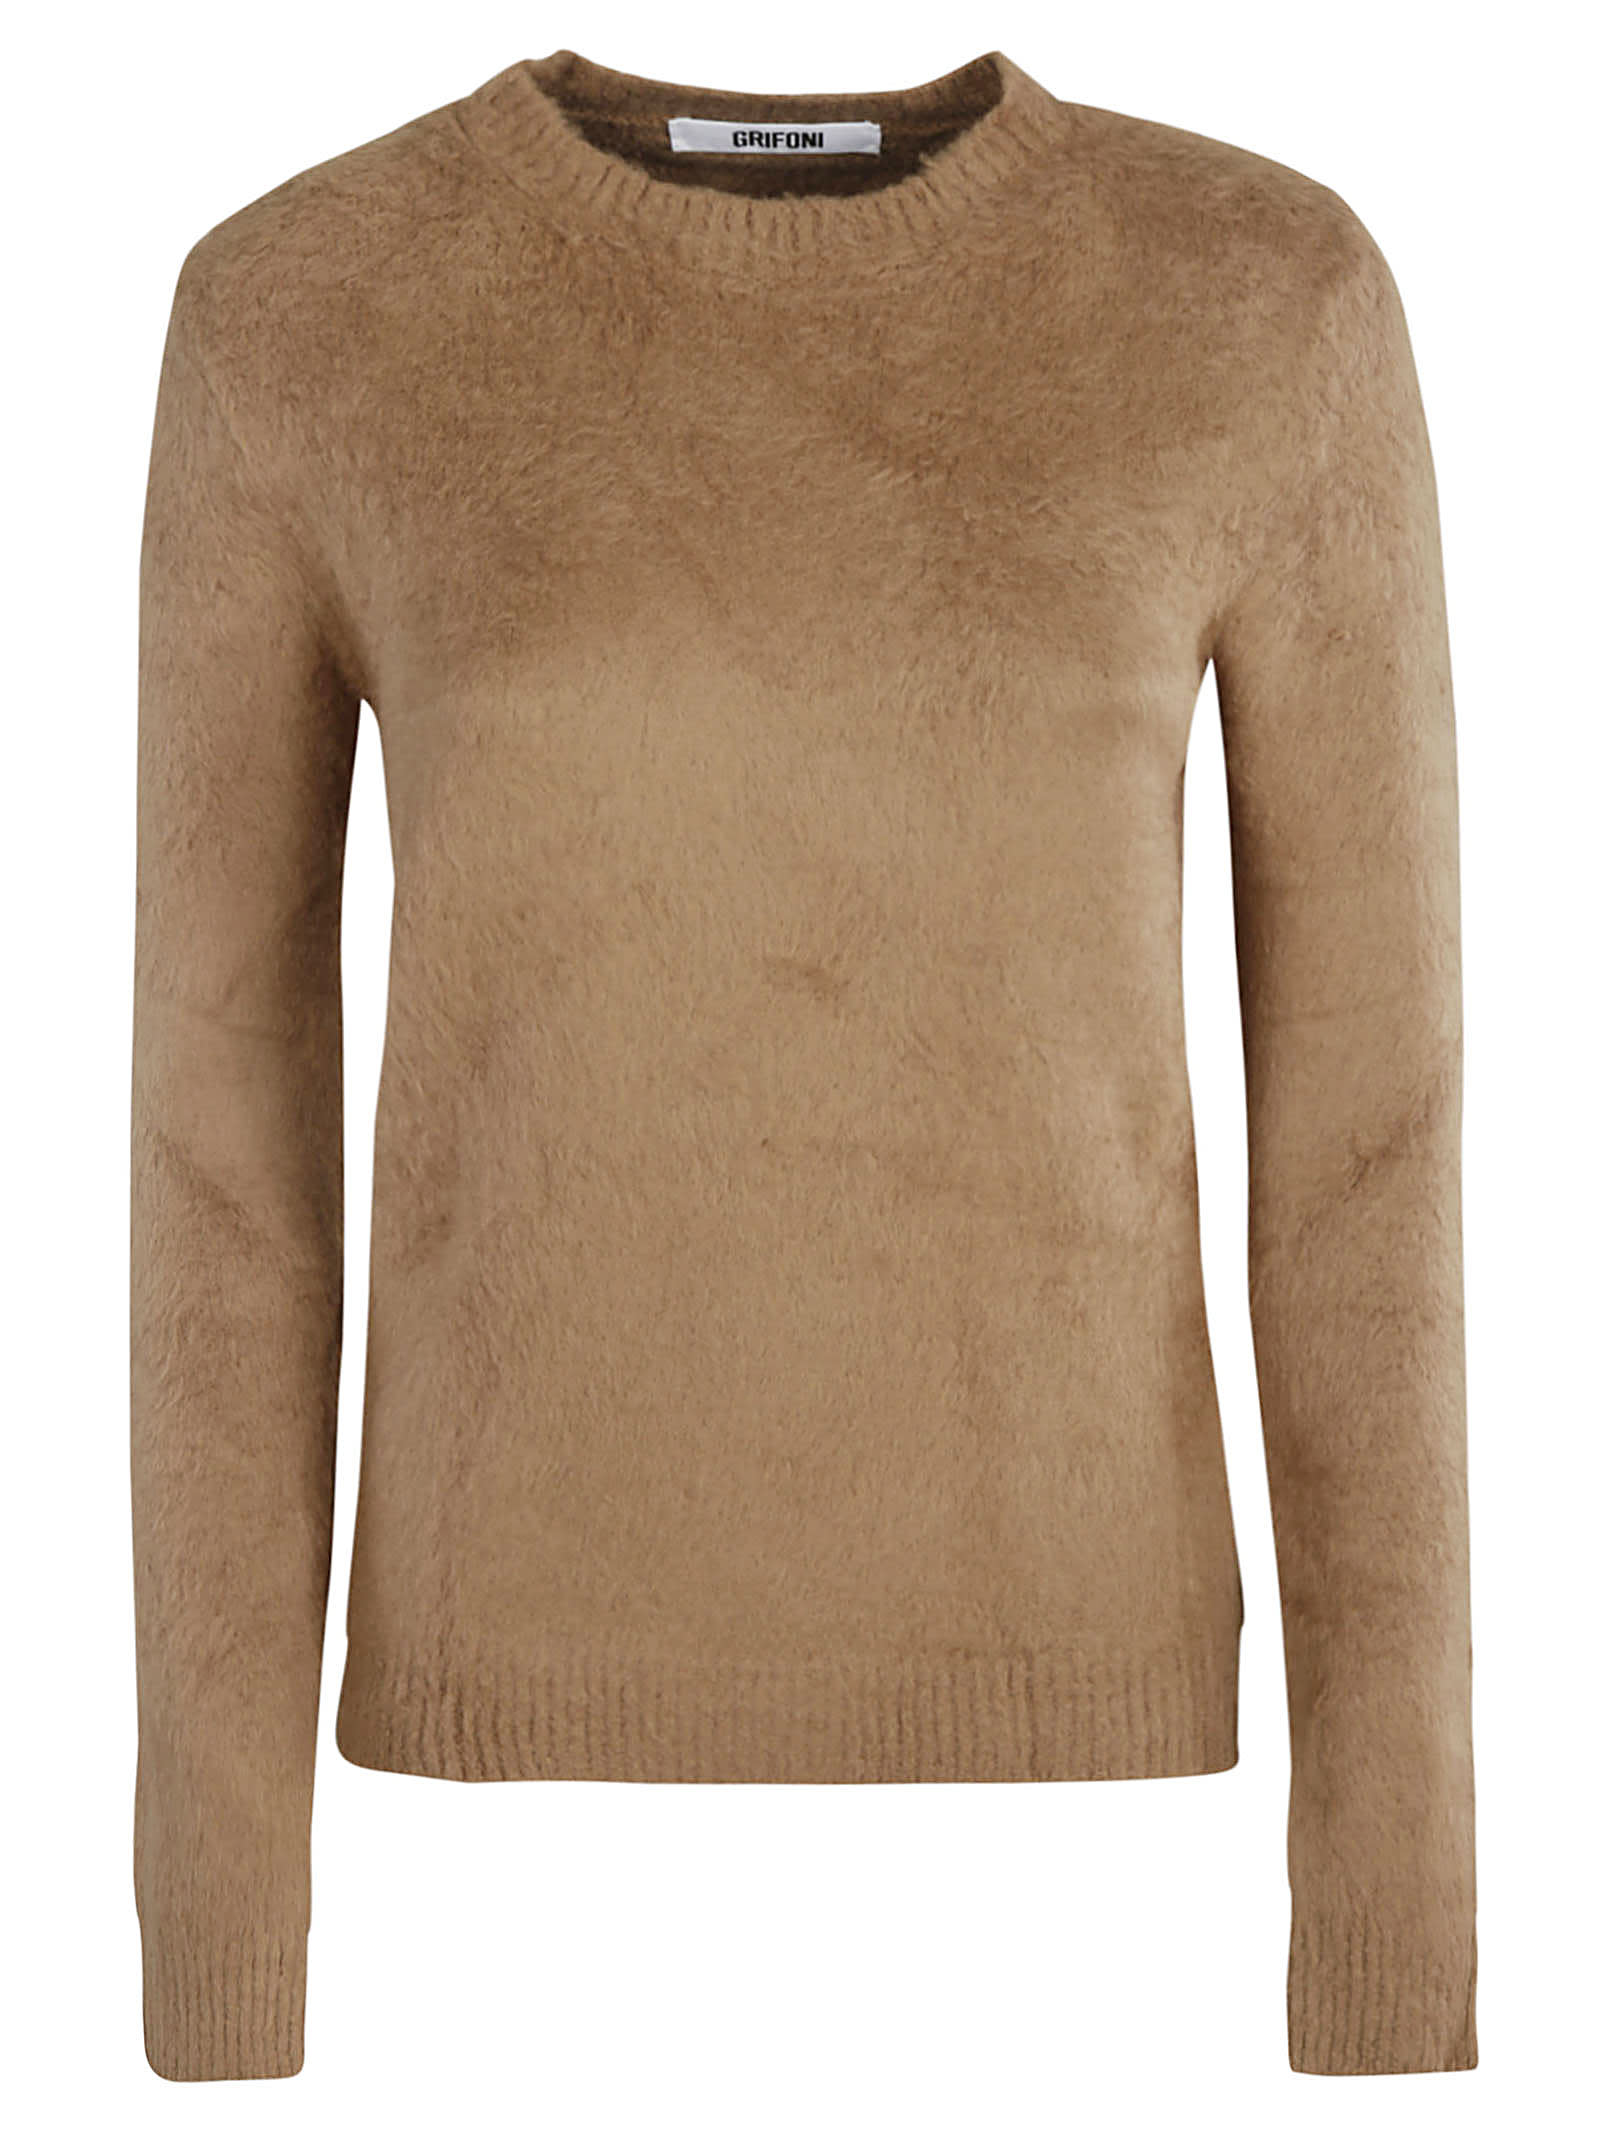 Fur Applique Ribbed Sweater